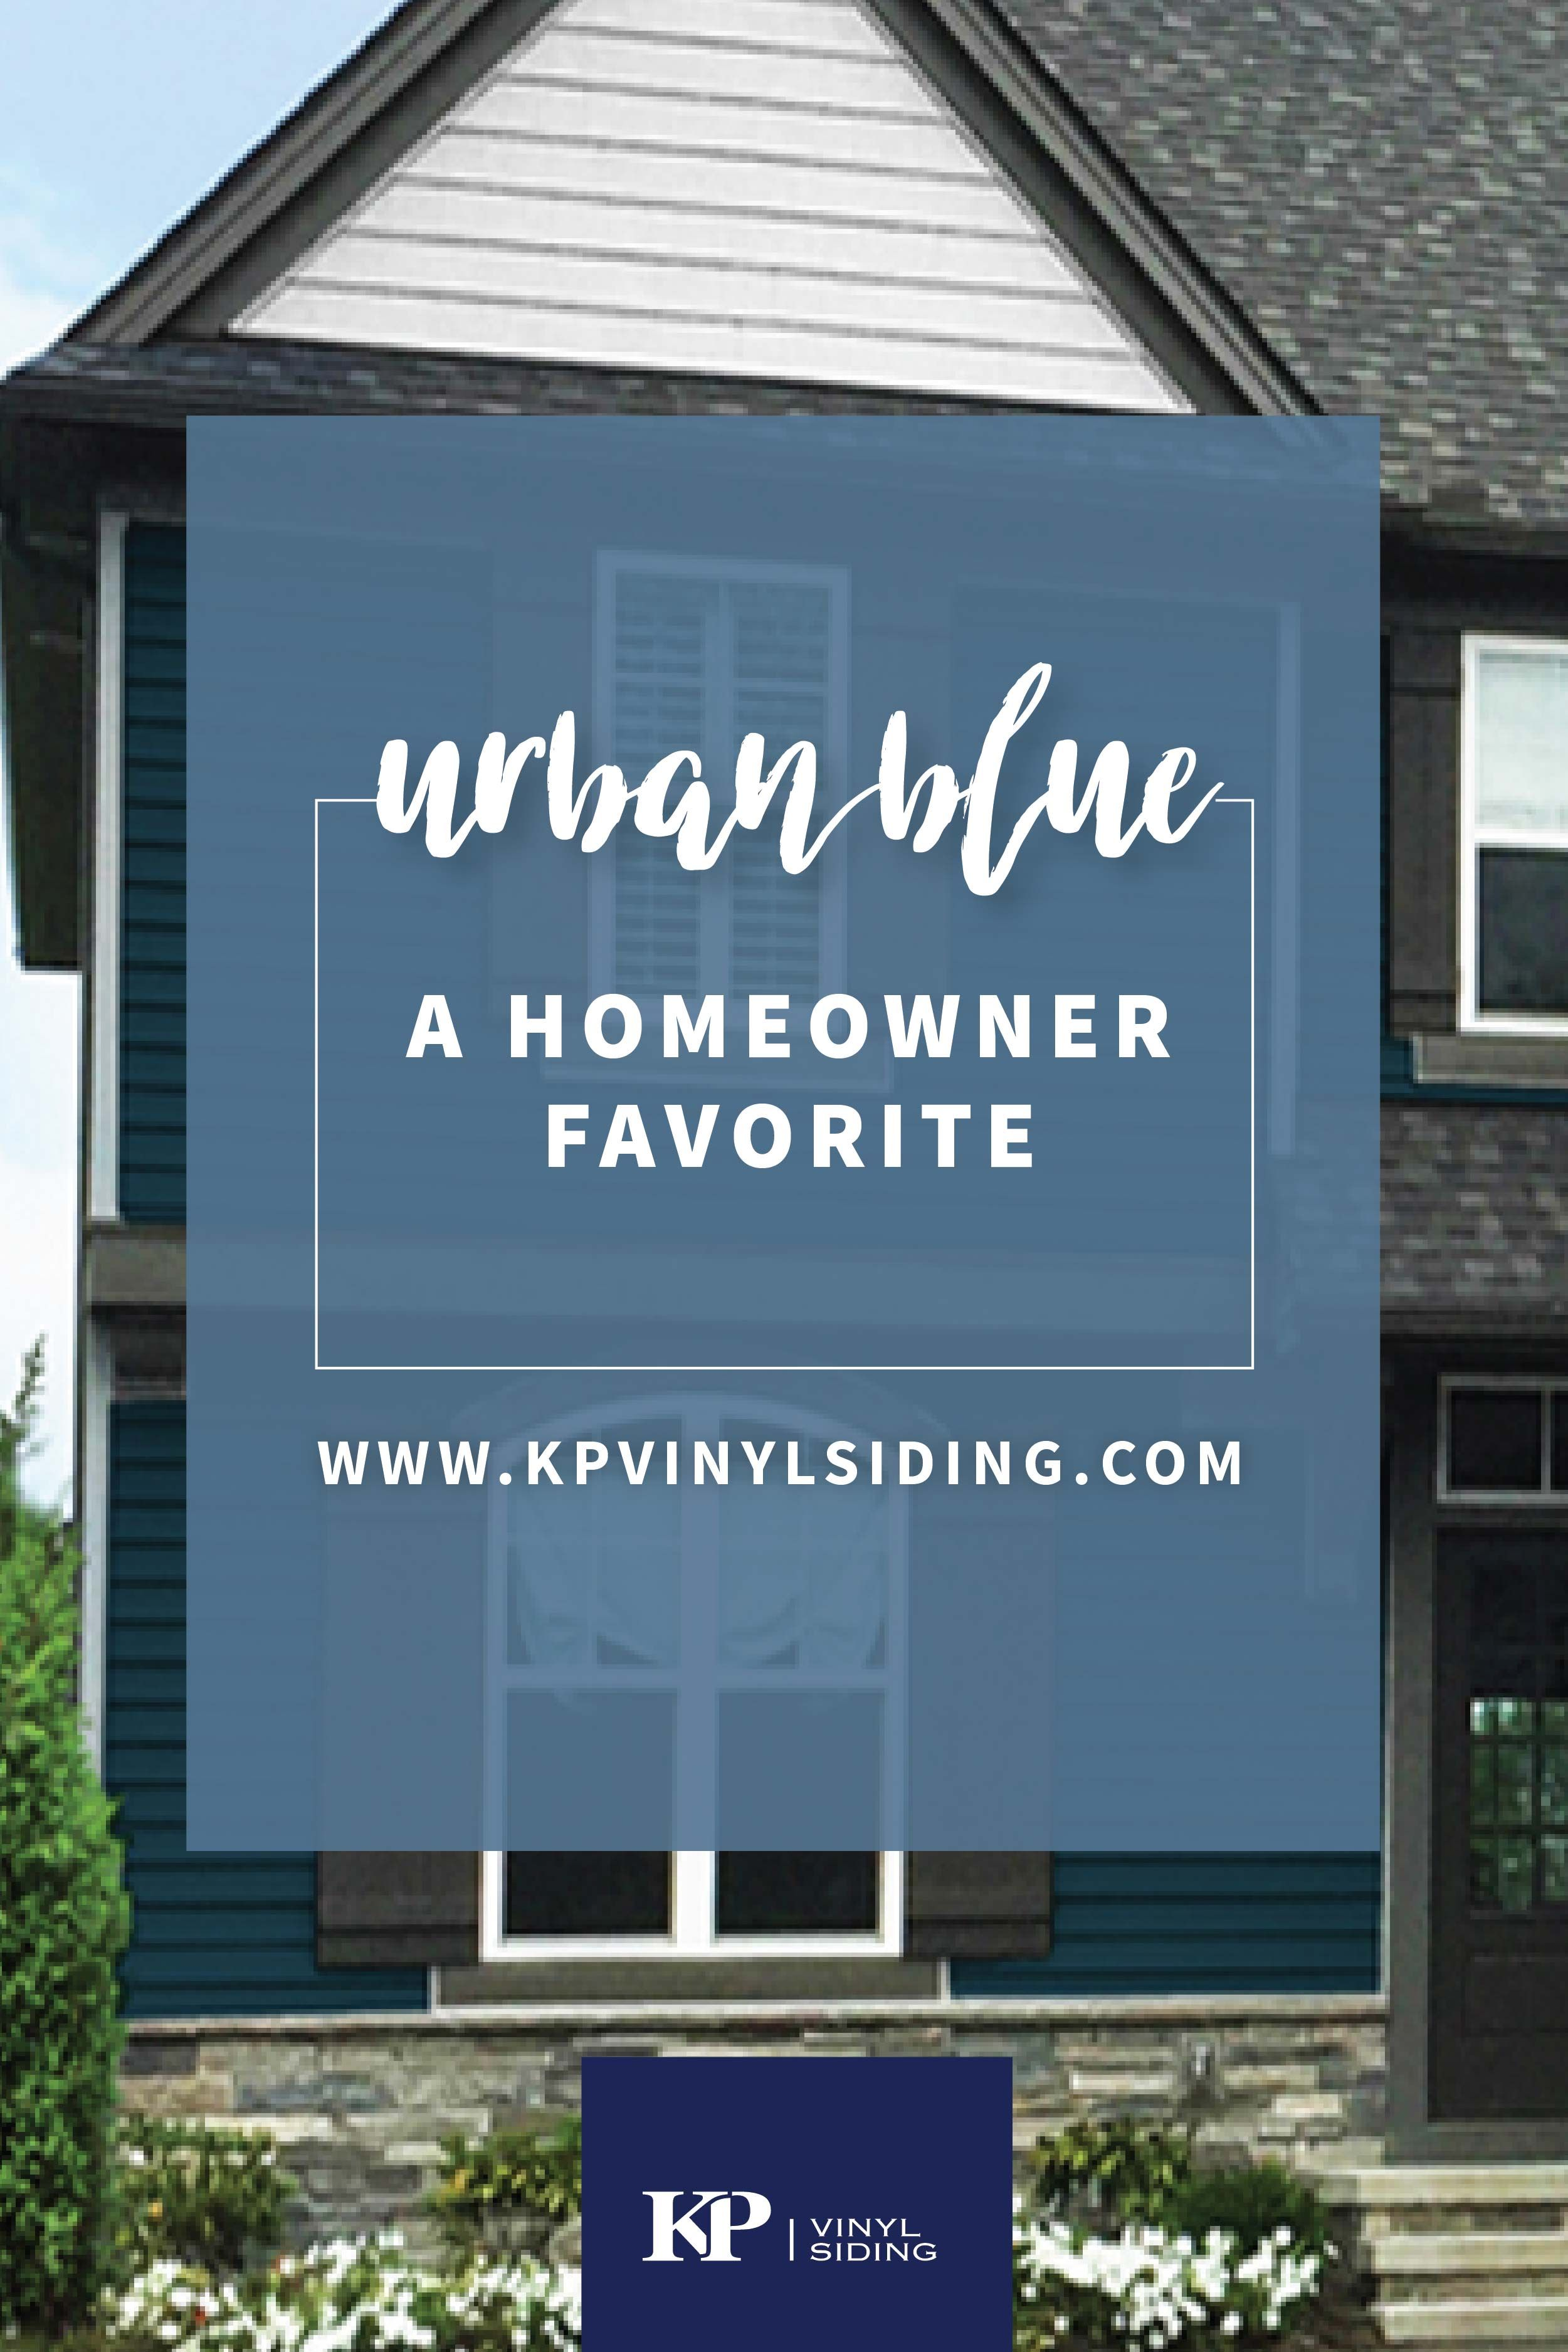 Explore Color With Urban Blue A Homeowner Favorite From Kp Vinyl Siding Vinyl Siding Blue Siding Blue Vinyl Siding